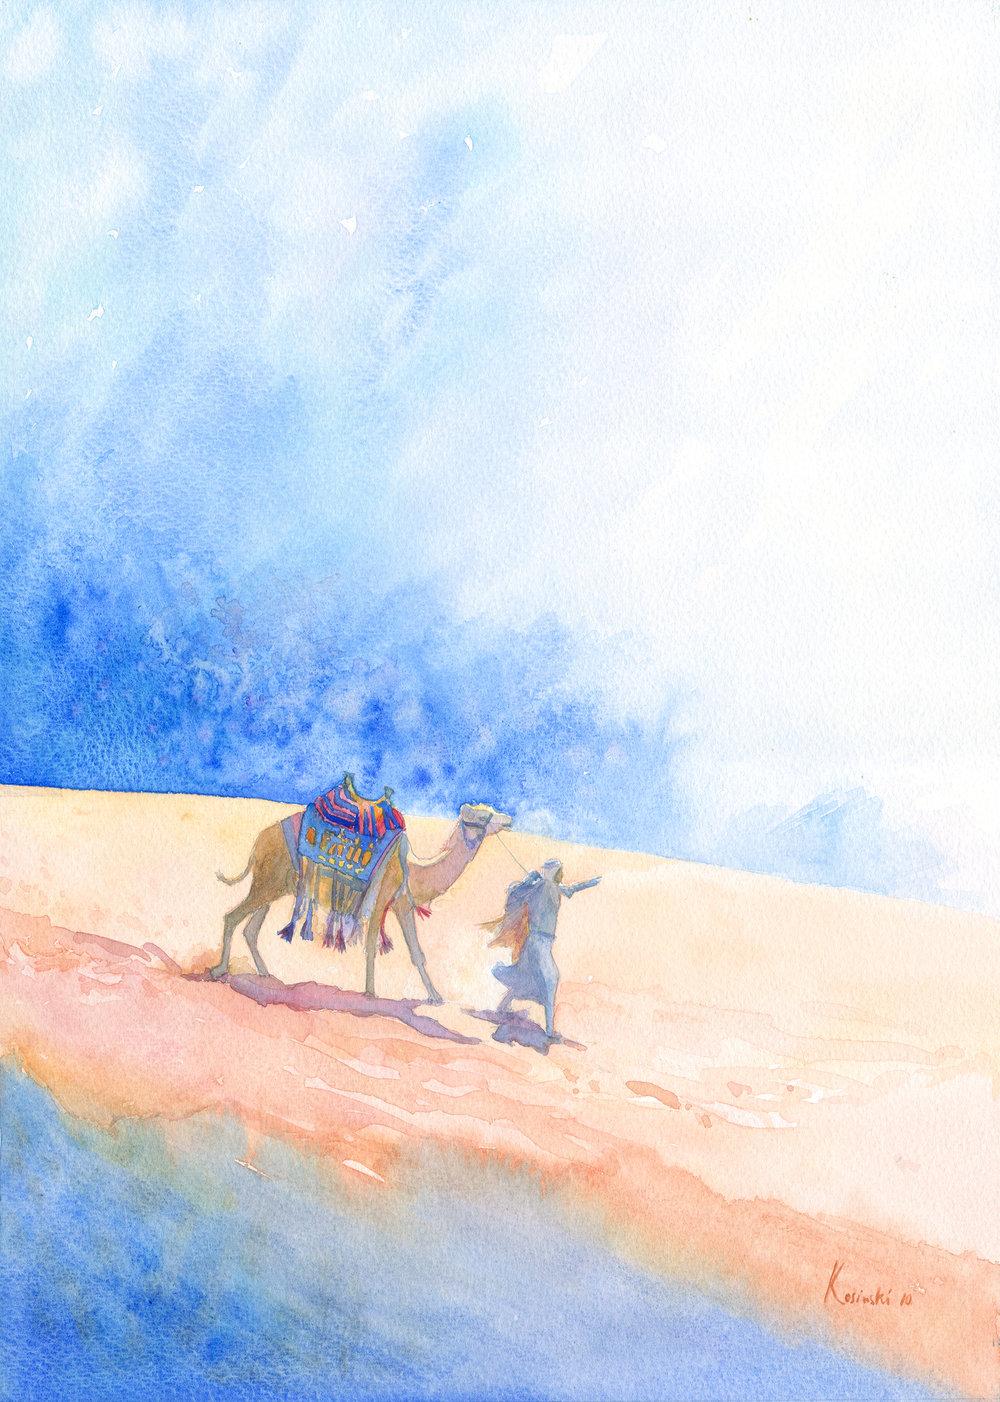 Camel Rider, Wadi Rum